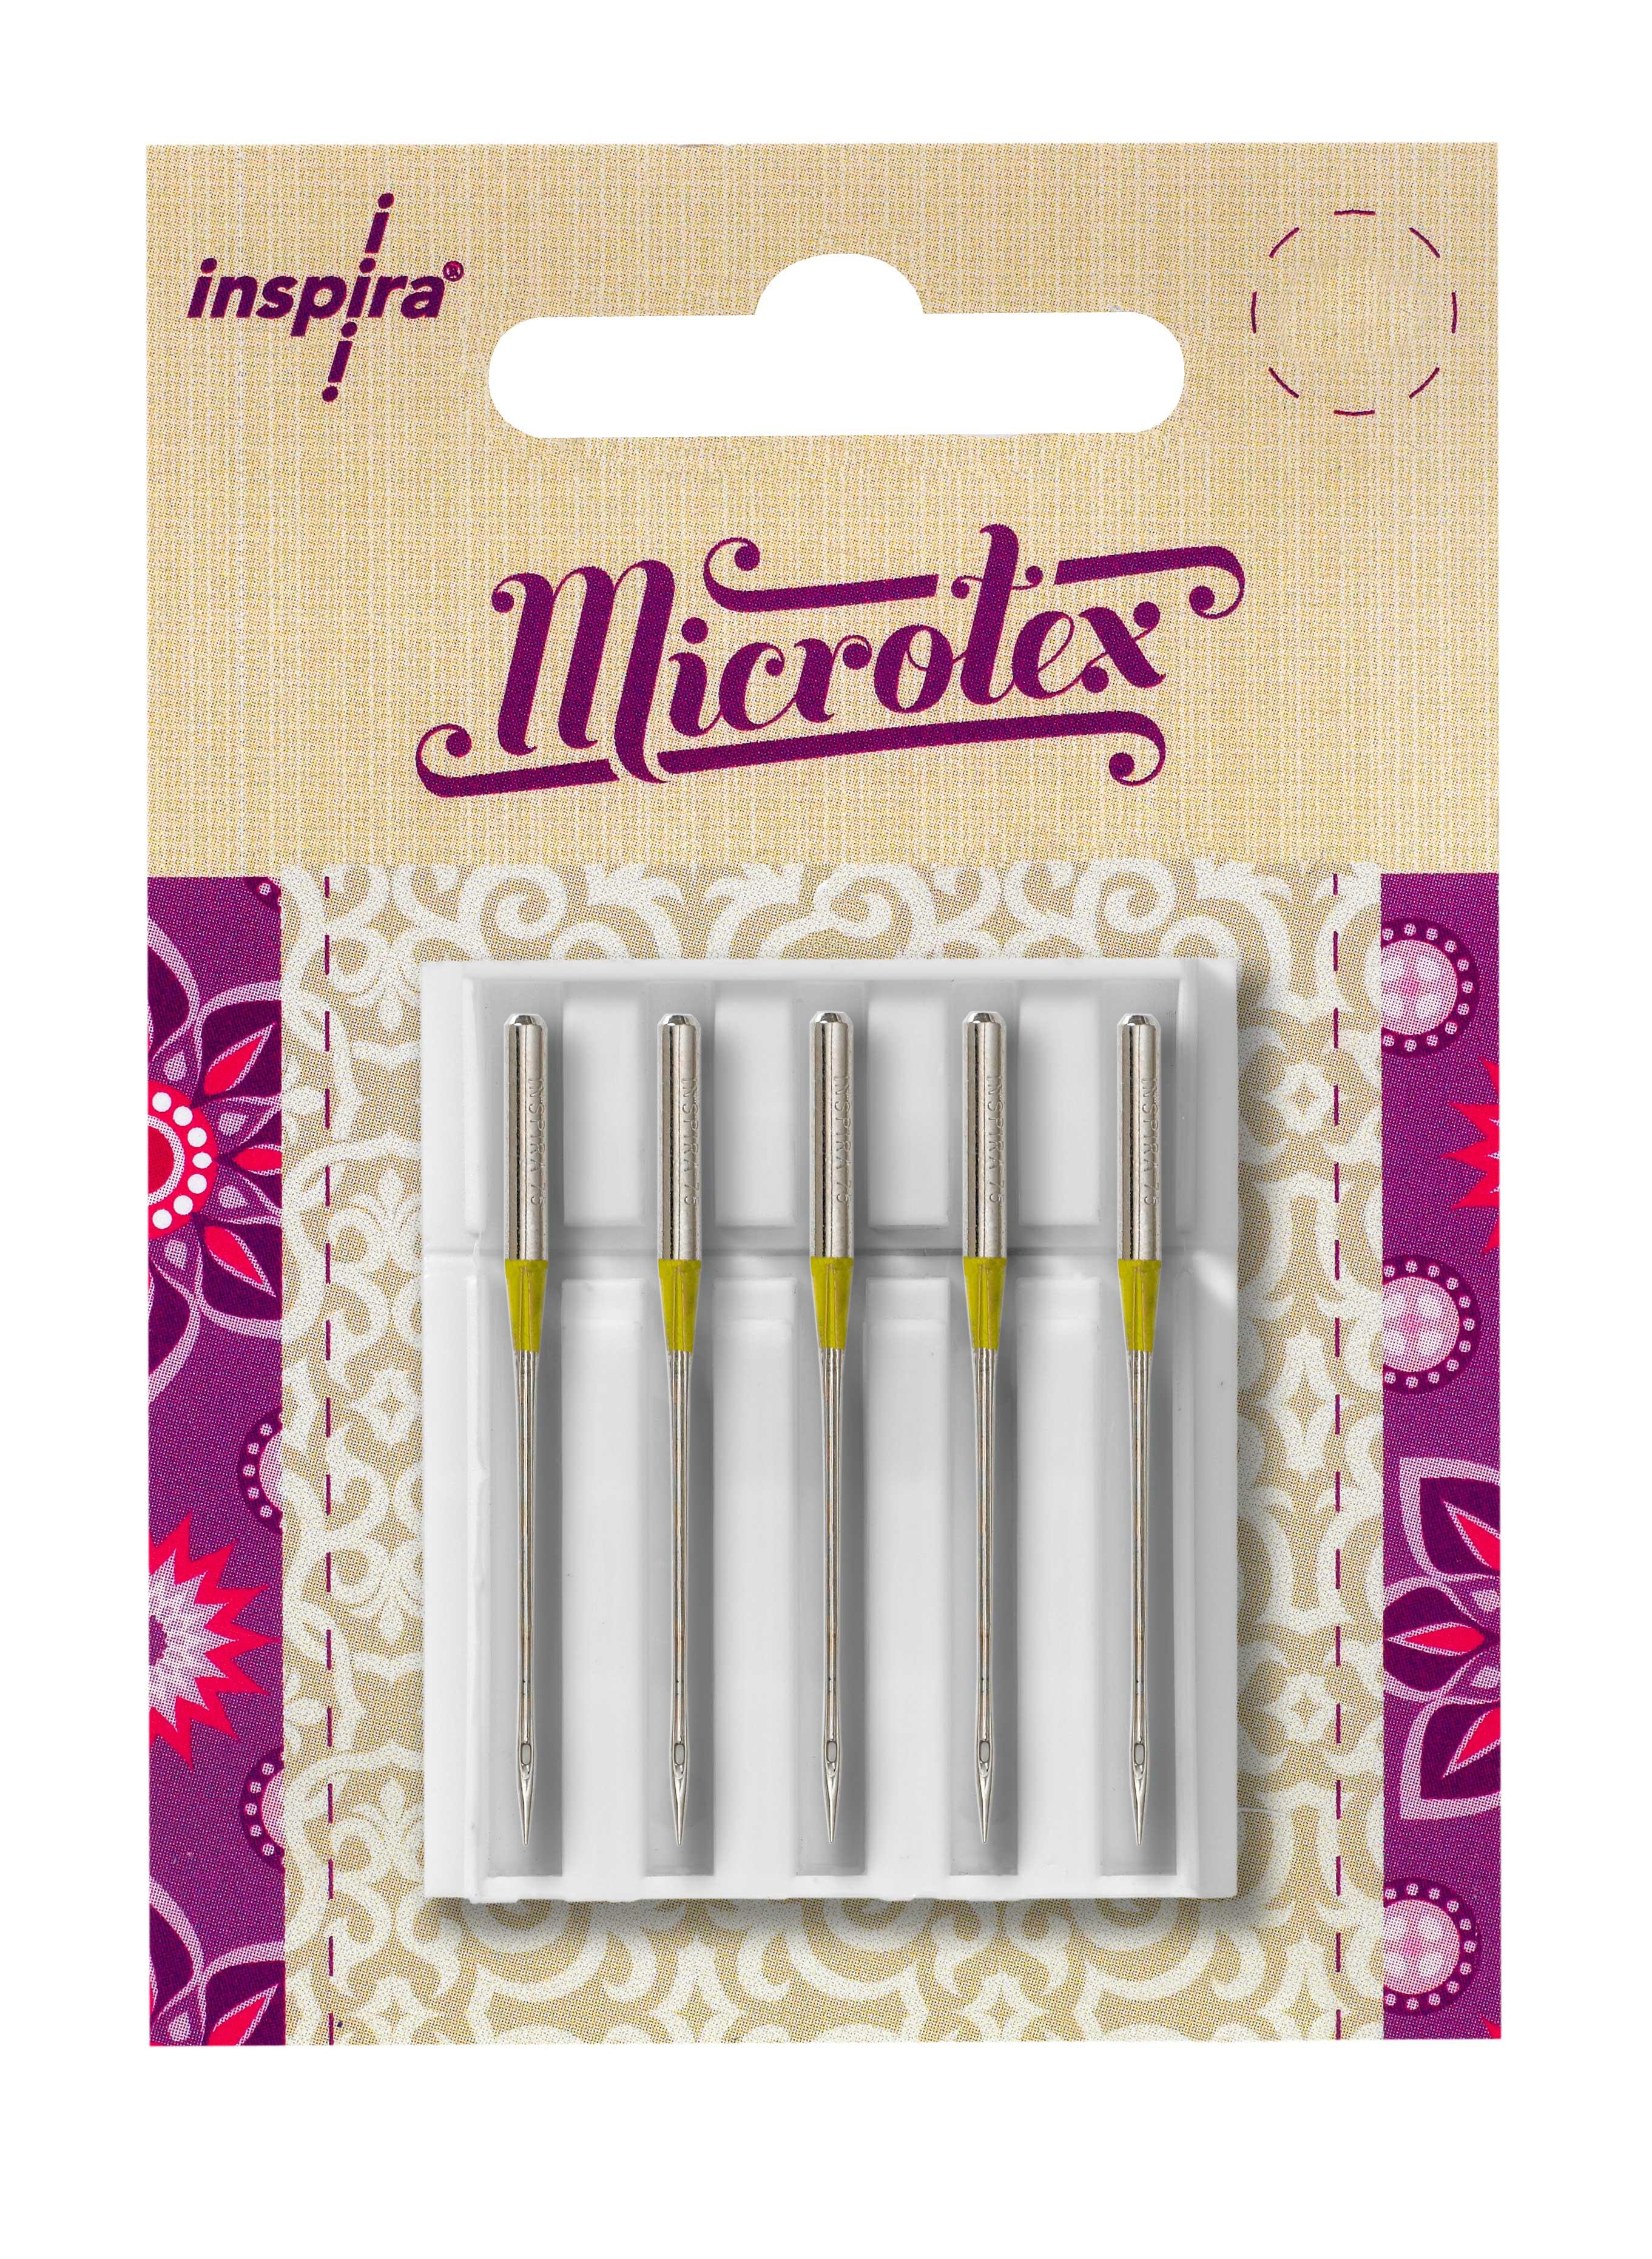 Microtex Needles size 80/12-5 pack Inspira